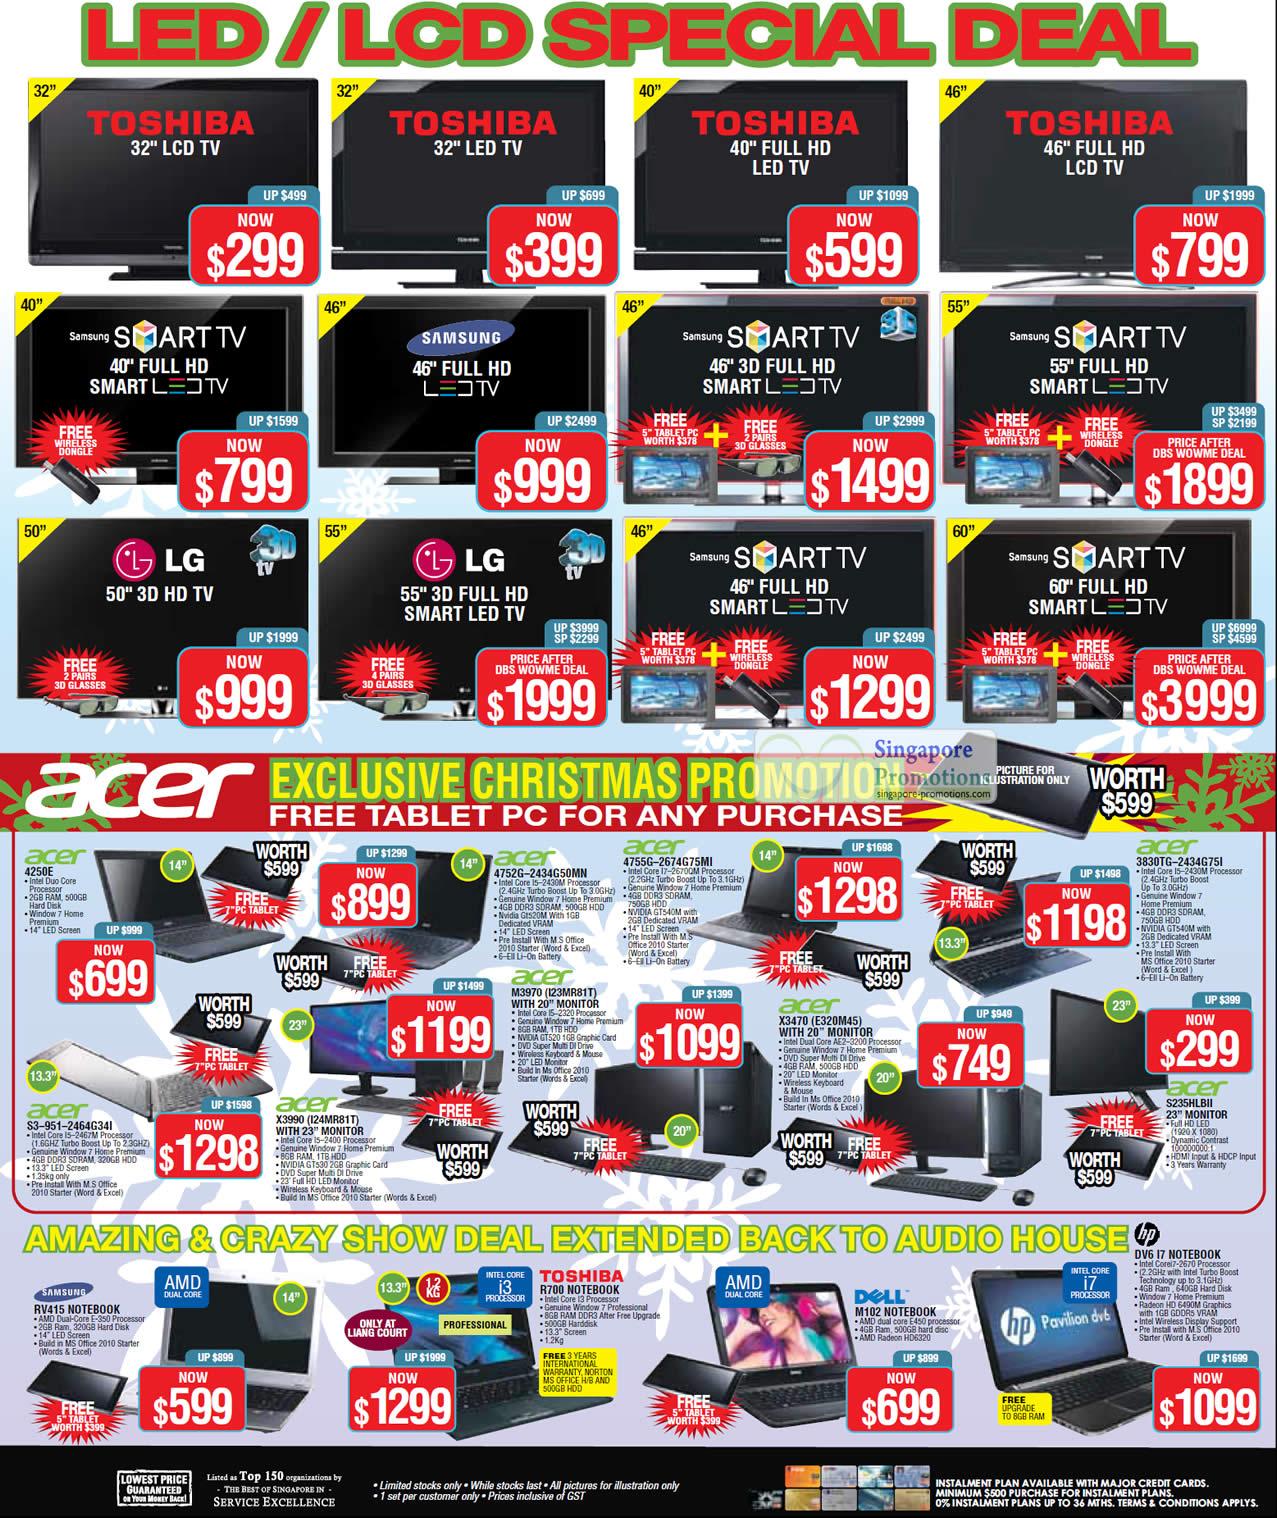 TV, Acer Notebooks, Desktop PC Acer 4250E Notebook, Acer S3-951-2464G34I Notebook, Acer X3990 i24MR81T Desktop PC, Acer 4752G-2434G50MN Notebook, Acer M3970 I23MR81T Desktop PC, Acer 4755G-2674G75MI Notebook, Acer X3470 E320M45 Desktop PC, Acer 3830TG-2434G75I Notebook, Acer S235HLBII Monitor, Samsung RV415 Notebook and Toshiba R700 Notebook and Dell M102 Notebook.